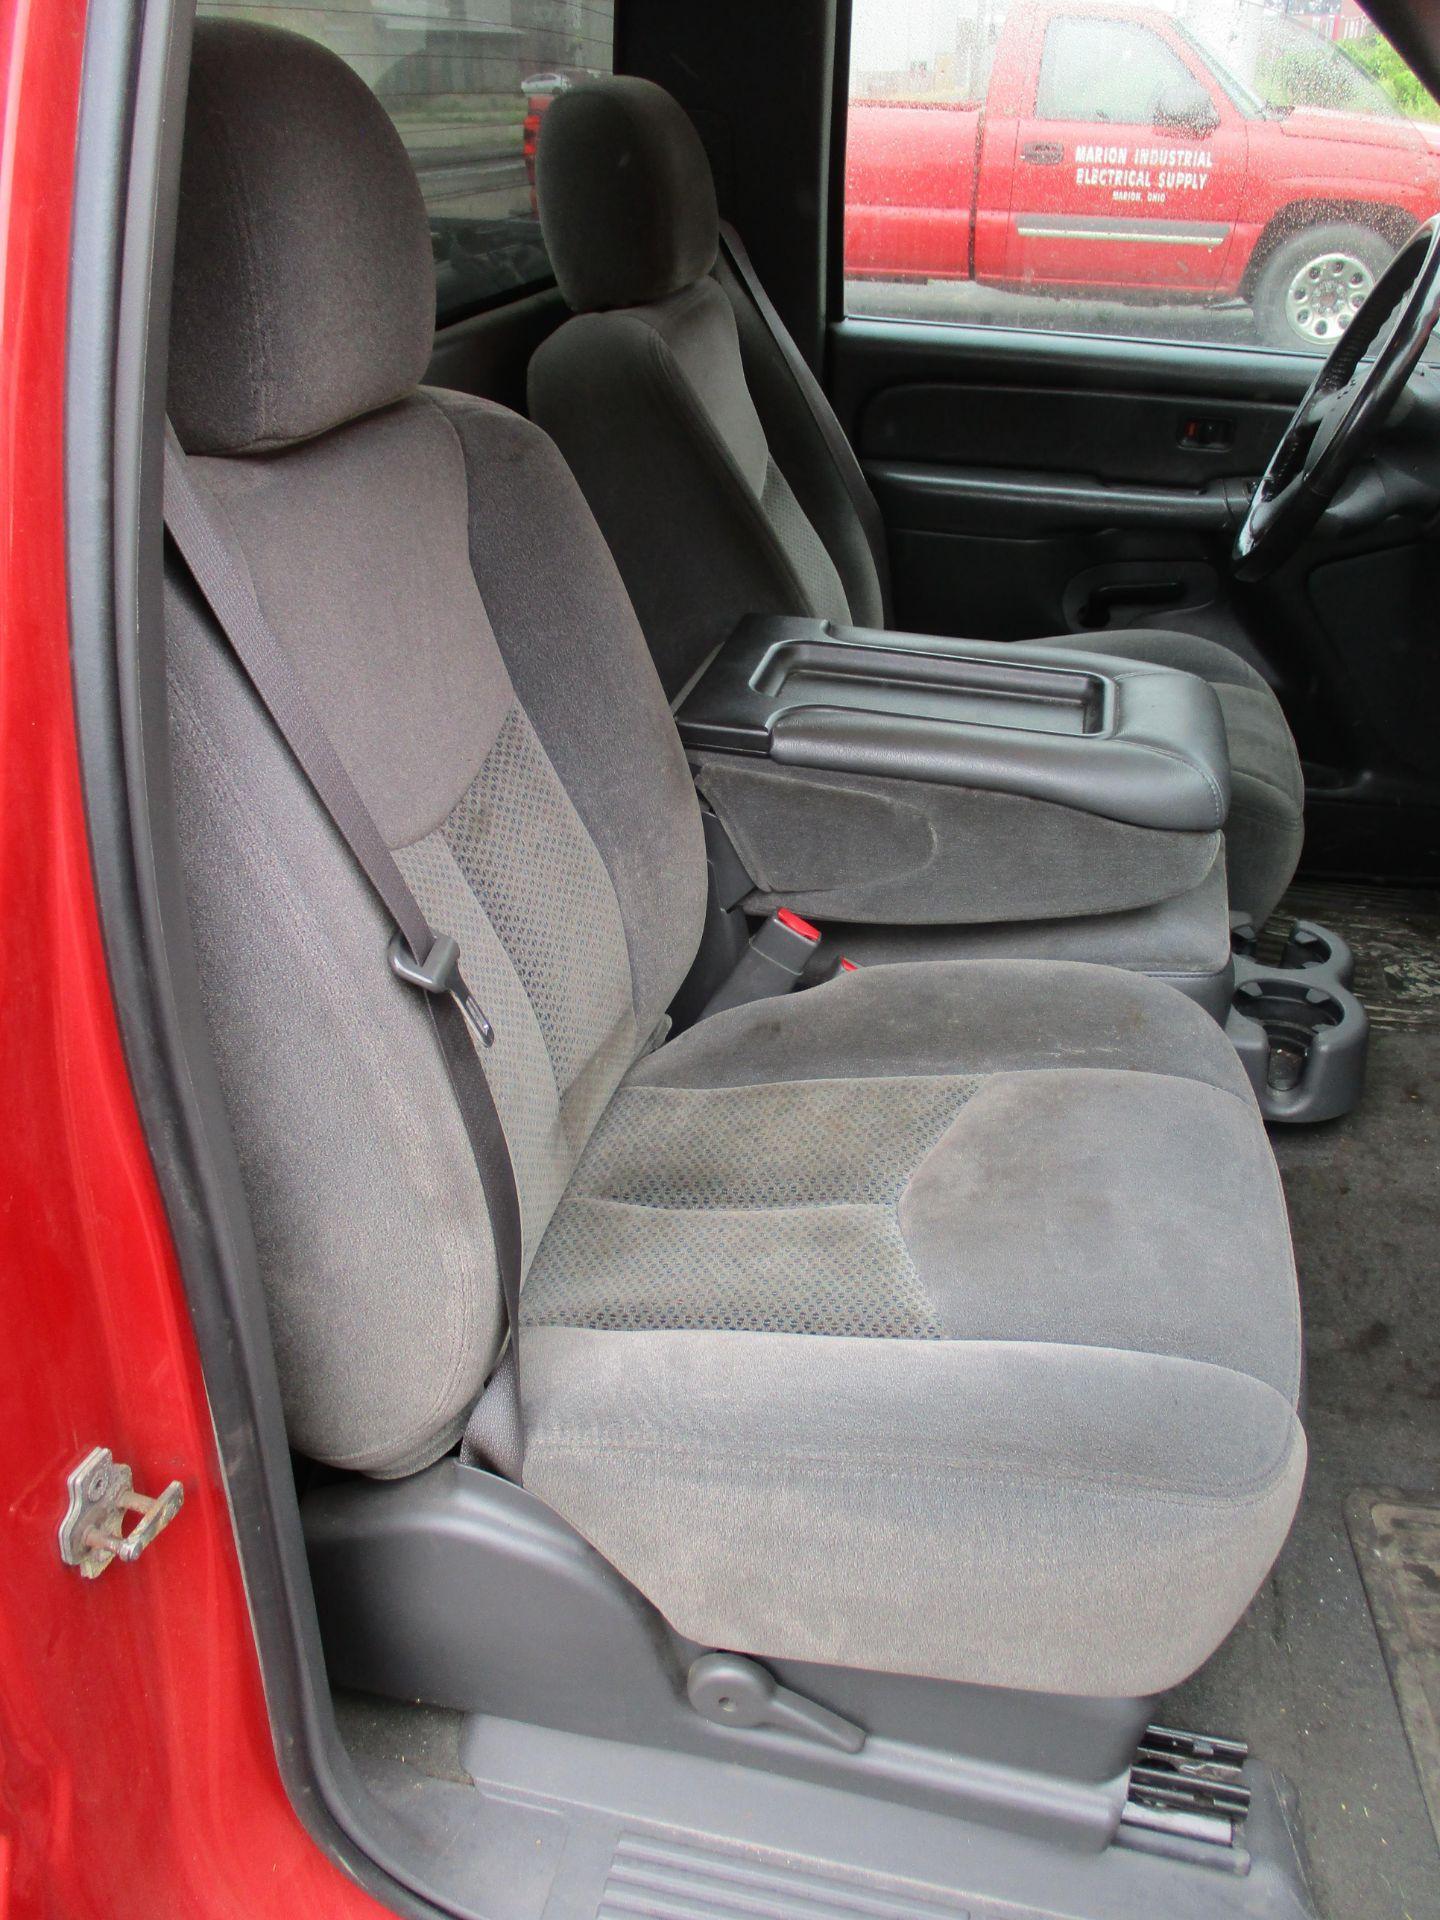 2006 Chevrolet Silverado 1500 LT Pickup, VIN 1GCEC14V96E251510, Regular Cab, Automatic, AC, 8' - Image 16 of 21